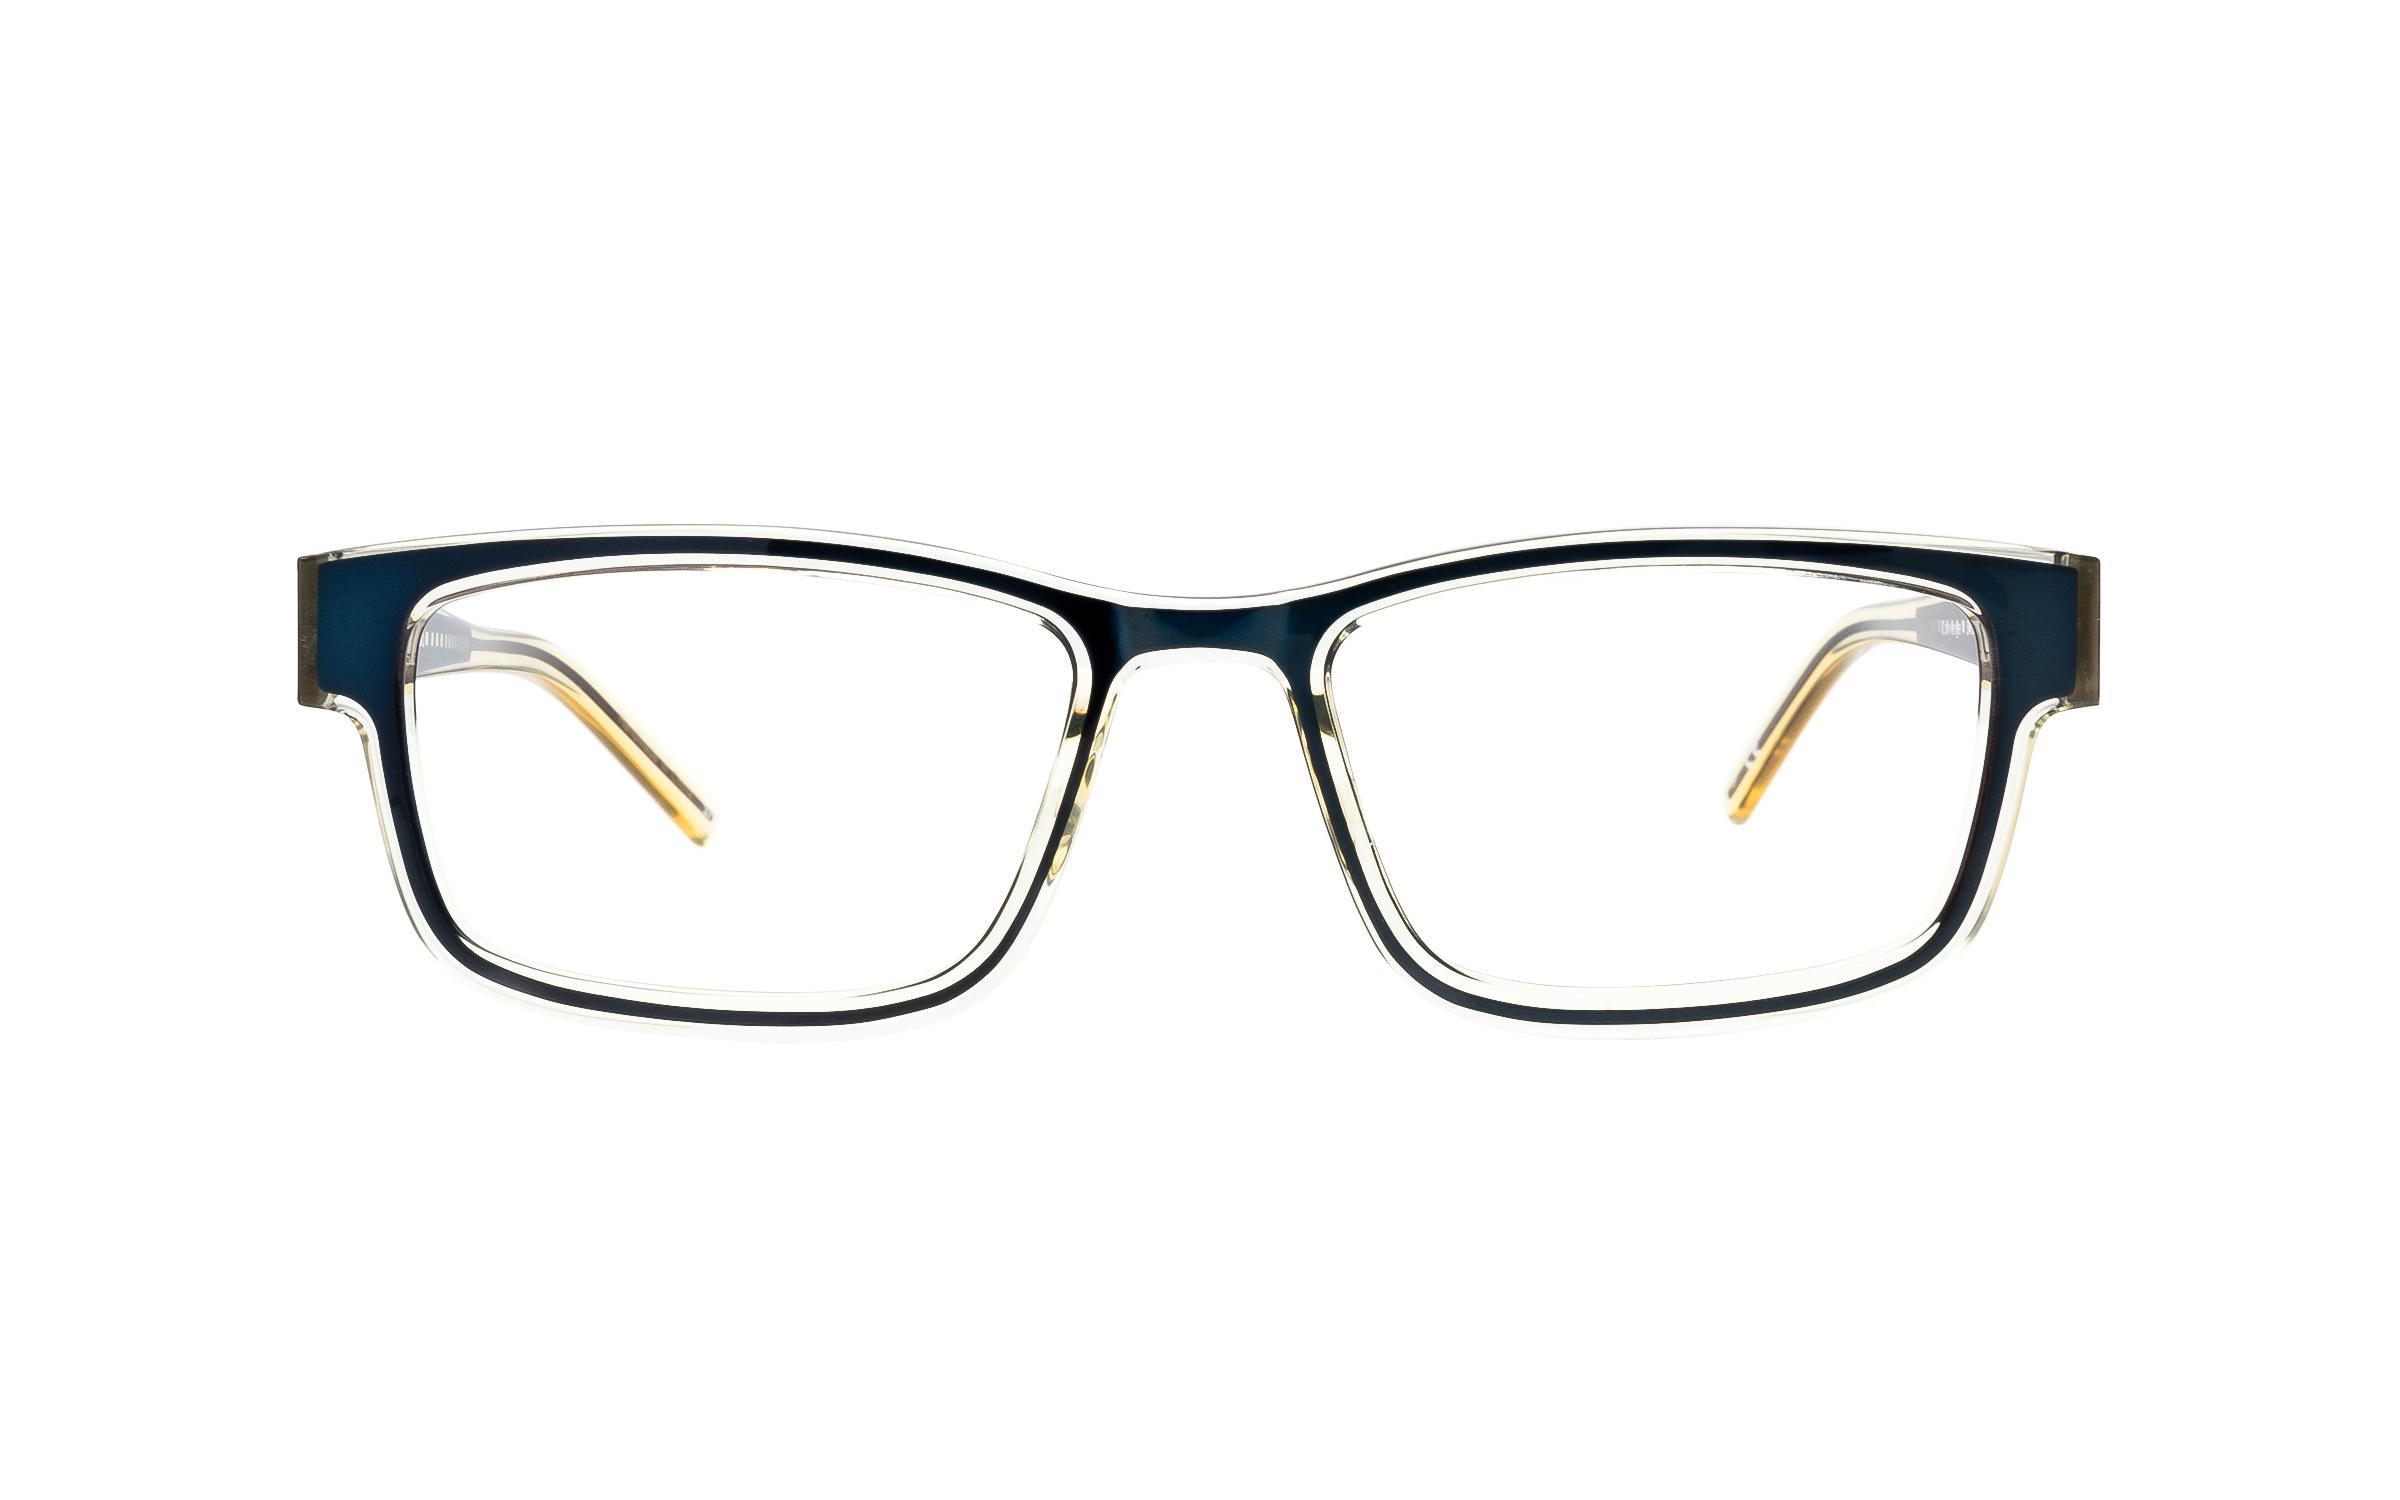 http://www.coastal.com/ - Jhane Barnes Converge NV (54) Eyeglasses and Frame in Navy Blue | Acetate – Online Coastal